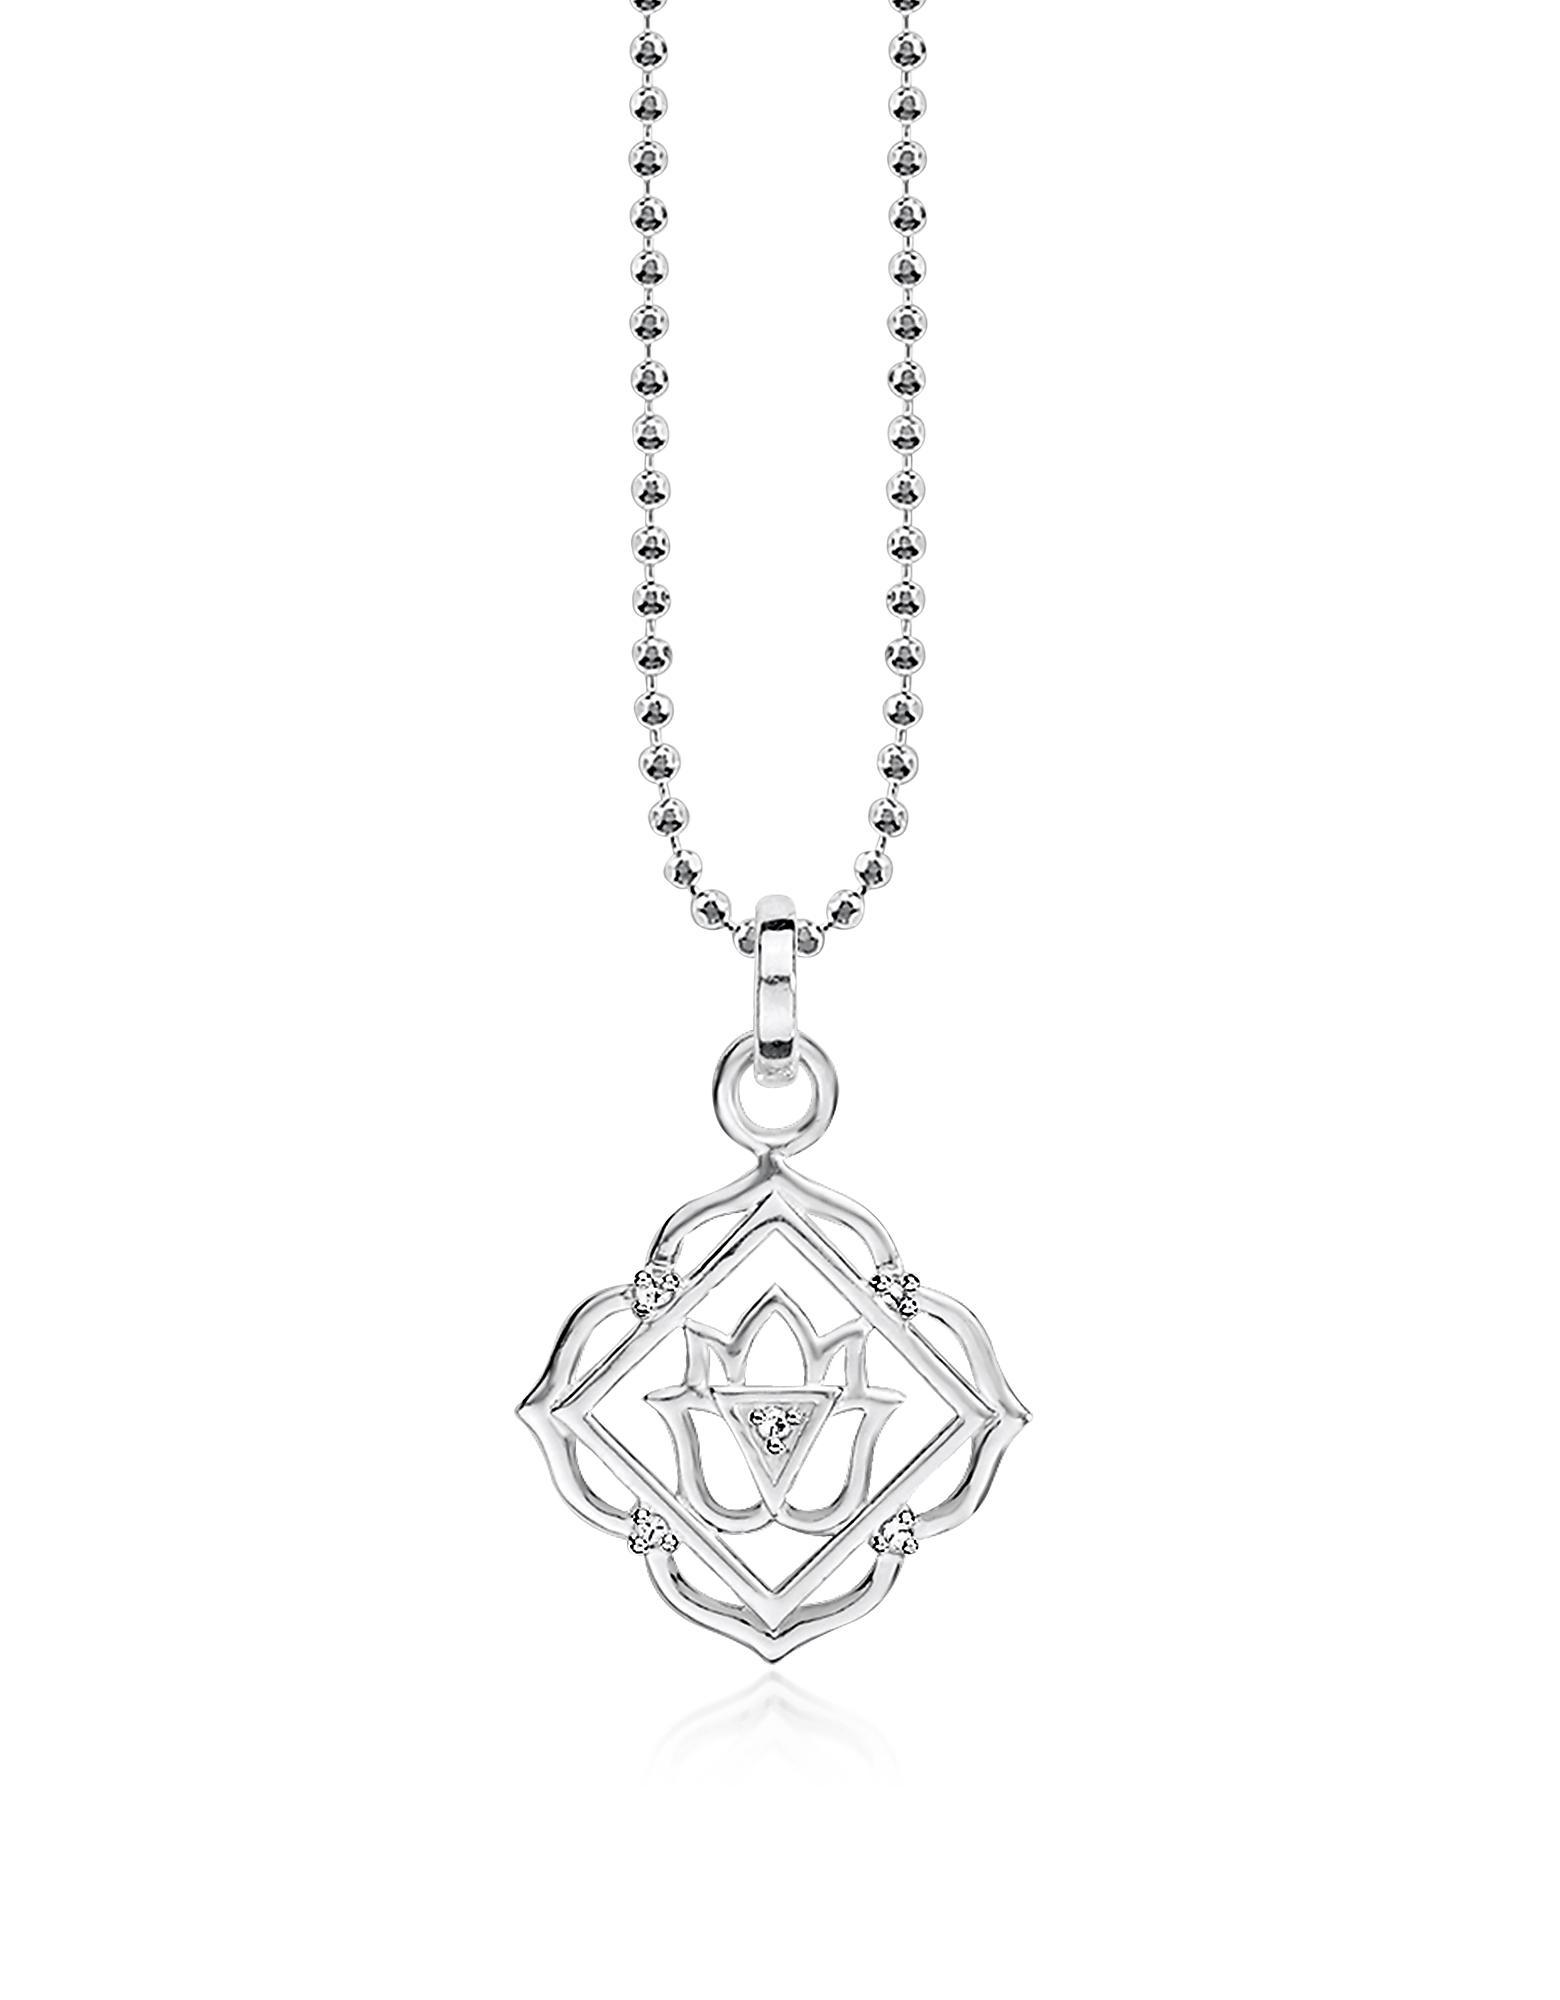 Thomas Sabo Women-Charm Pendant Lucky Charm Club 925 Sterling Silver Zirconia white 0870-051-14